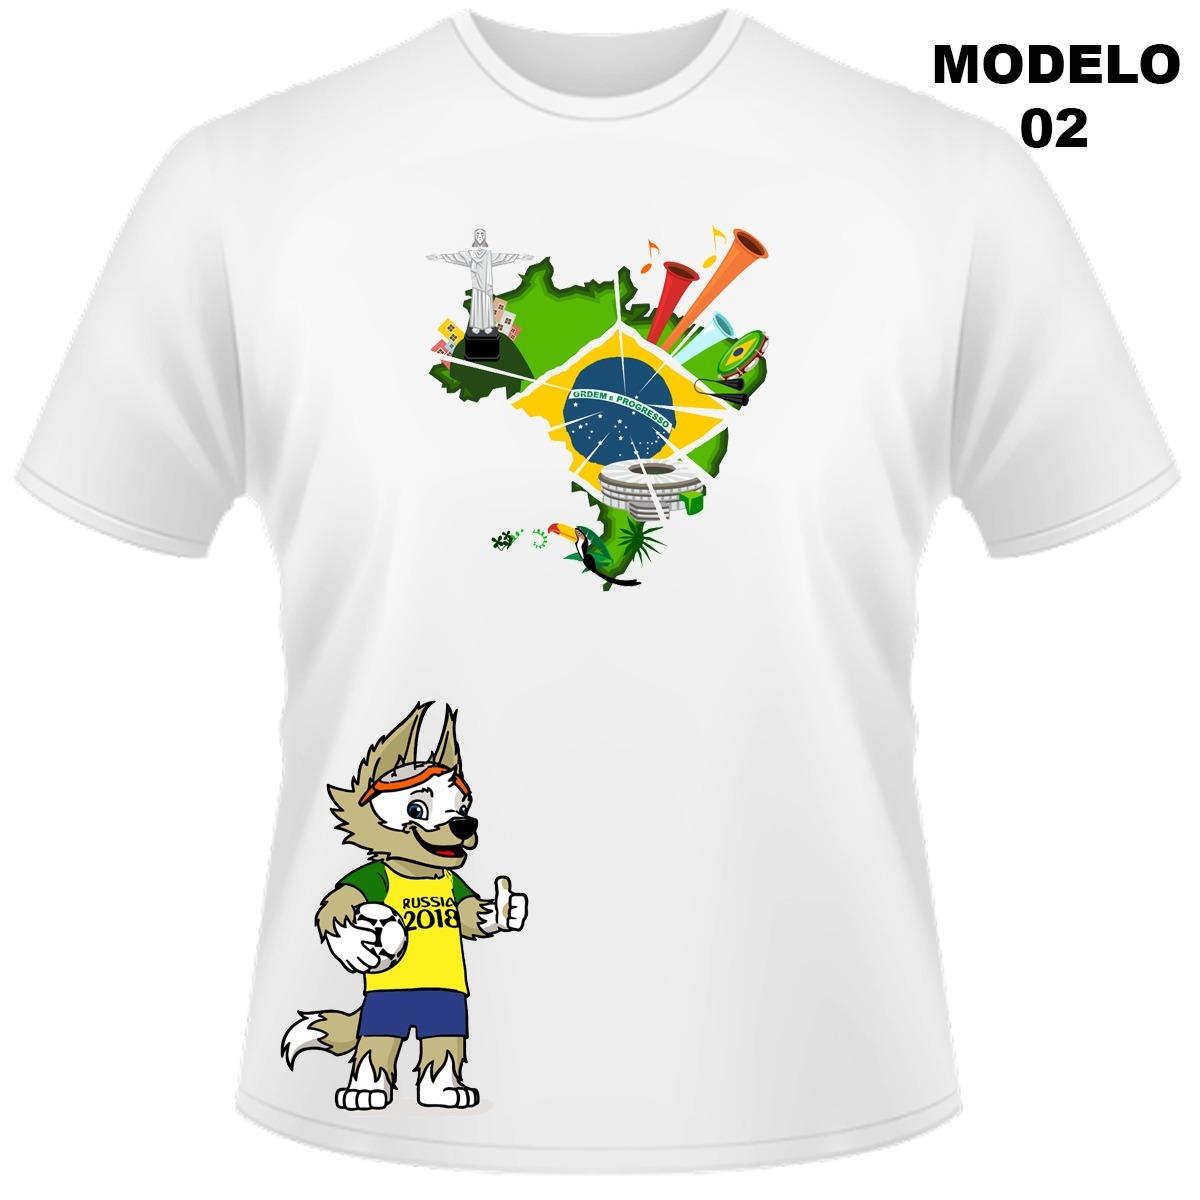 camiseta personalizada brasil copa 03. Carregando zoom. 018842b4d7241